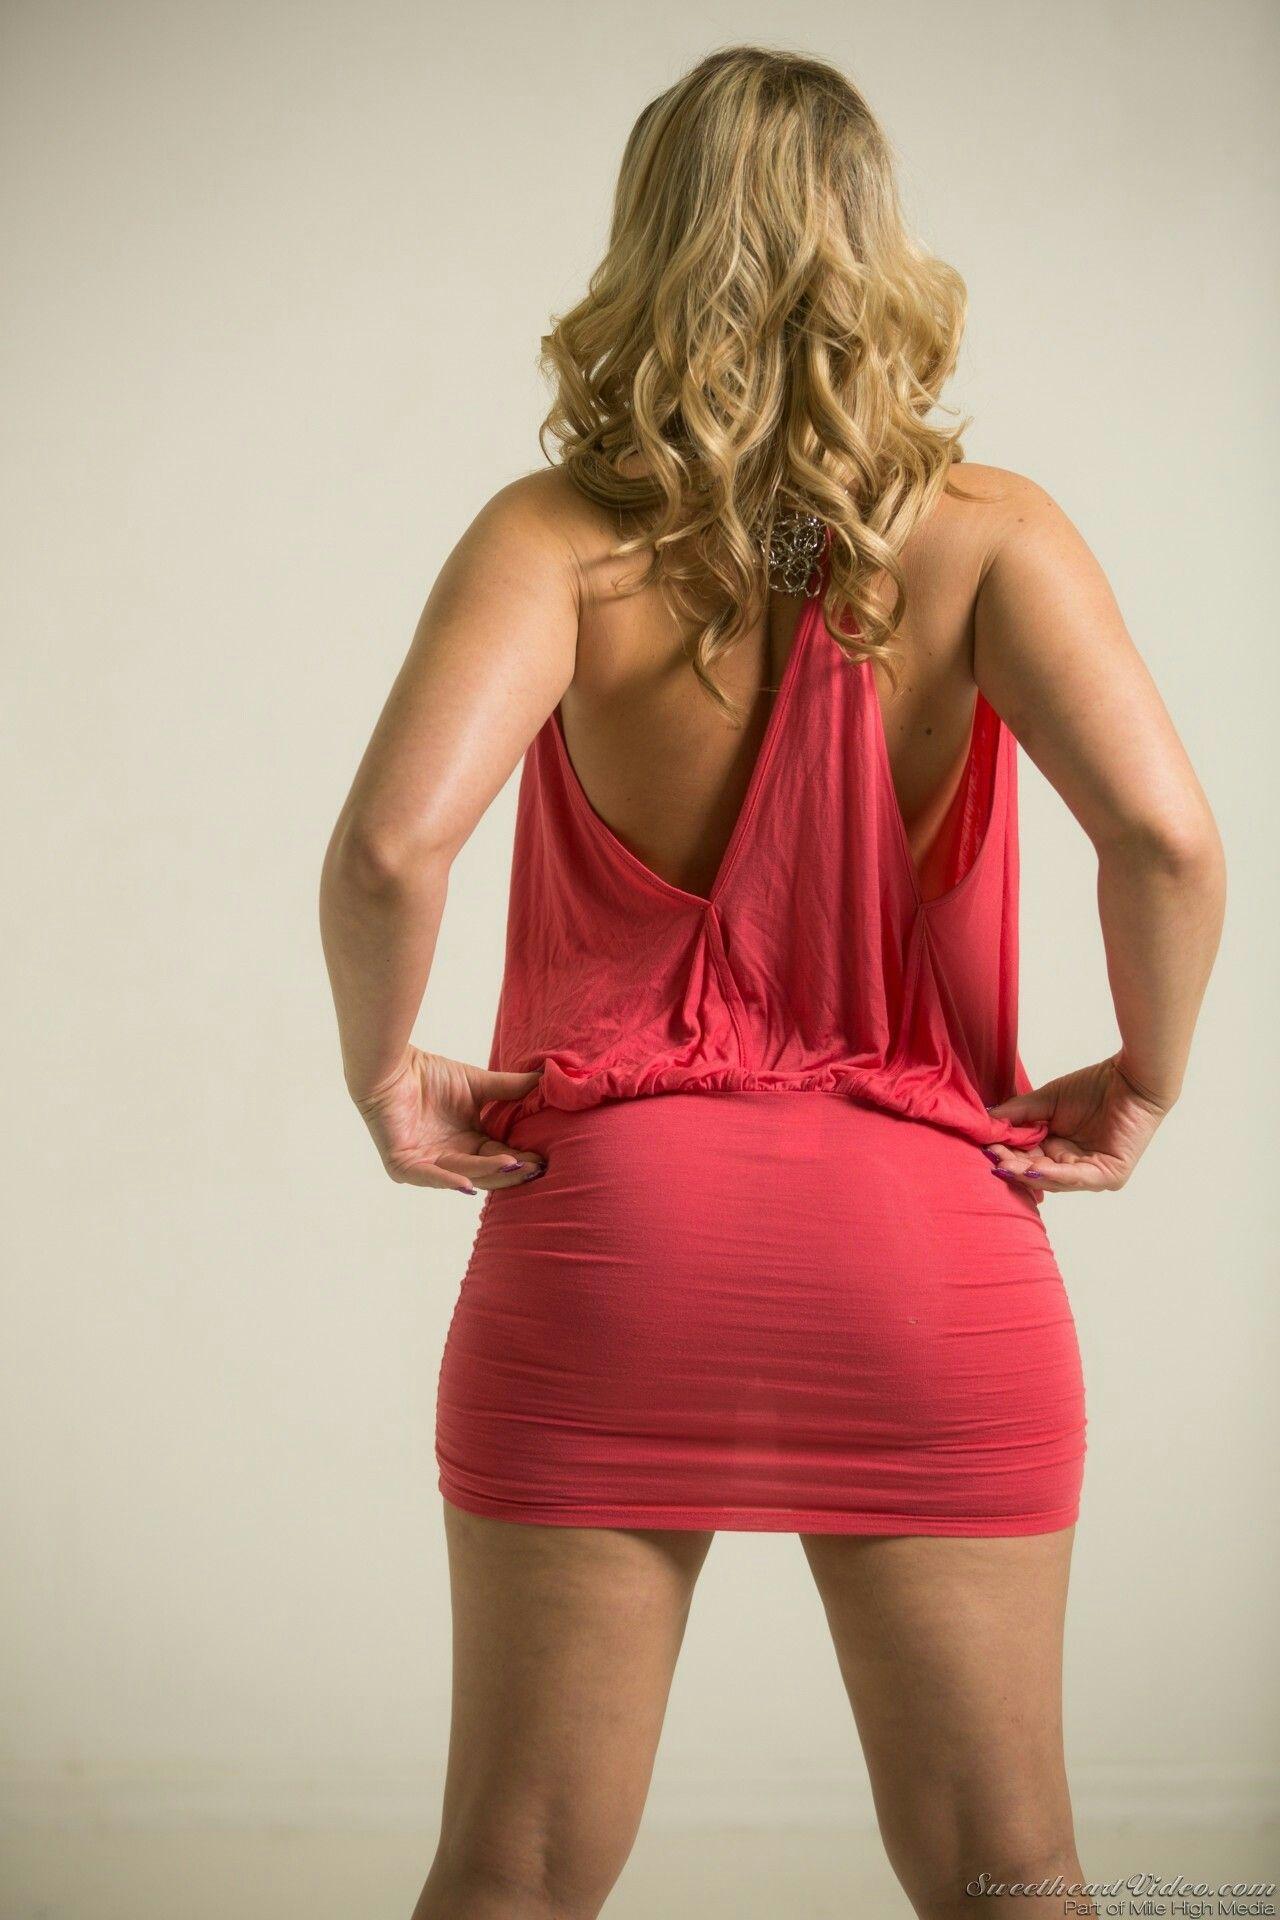 Frankie Fatale Nude Photos 4